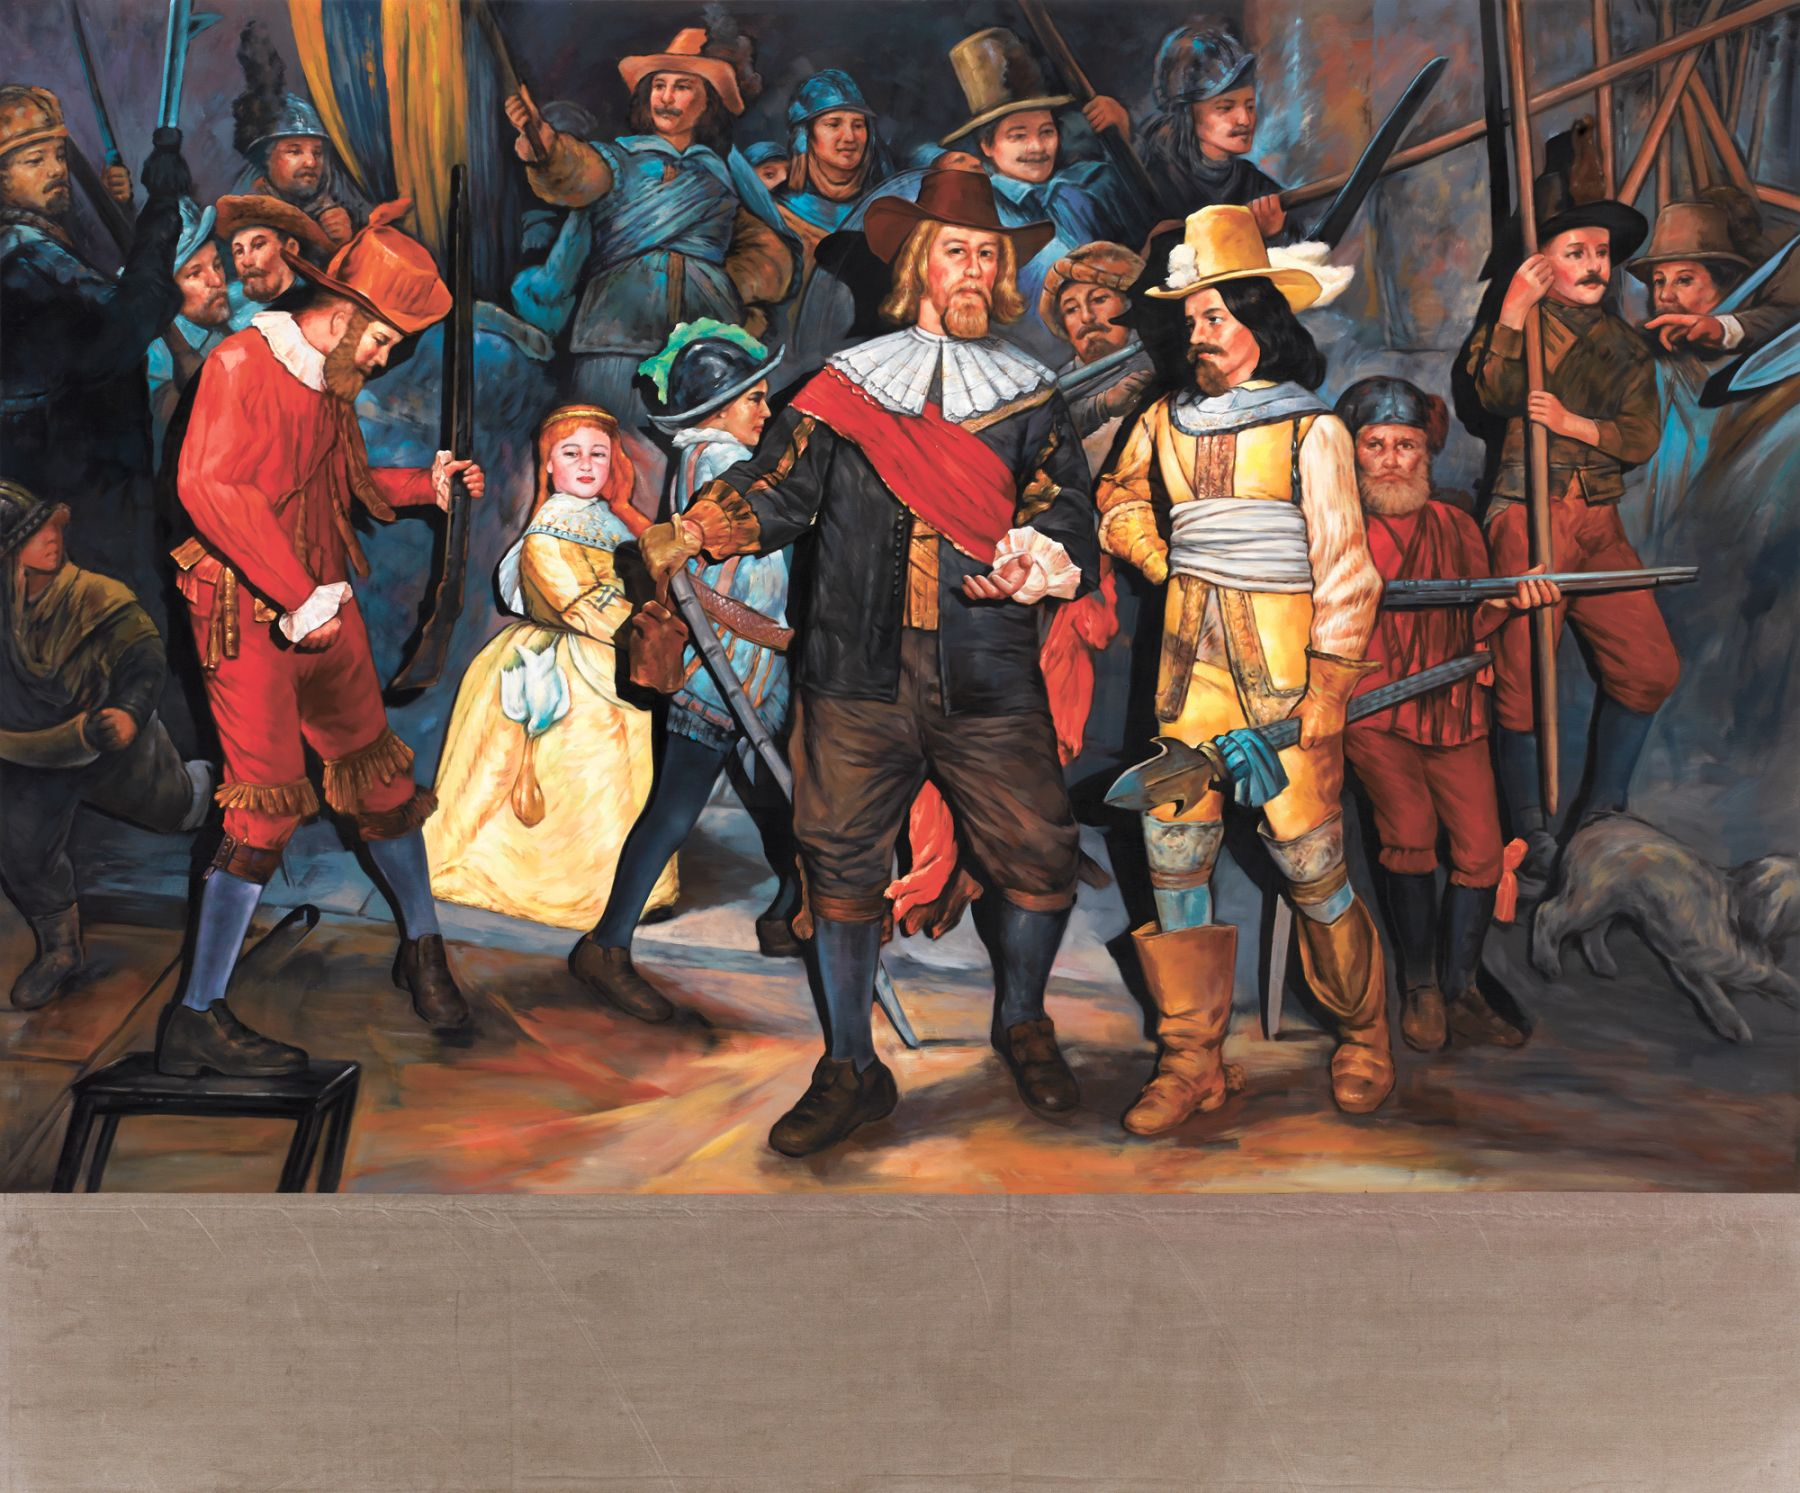 Christian Jankowski, Neue Malerei - Rembrandt II